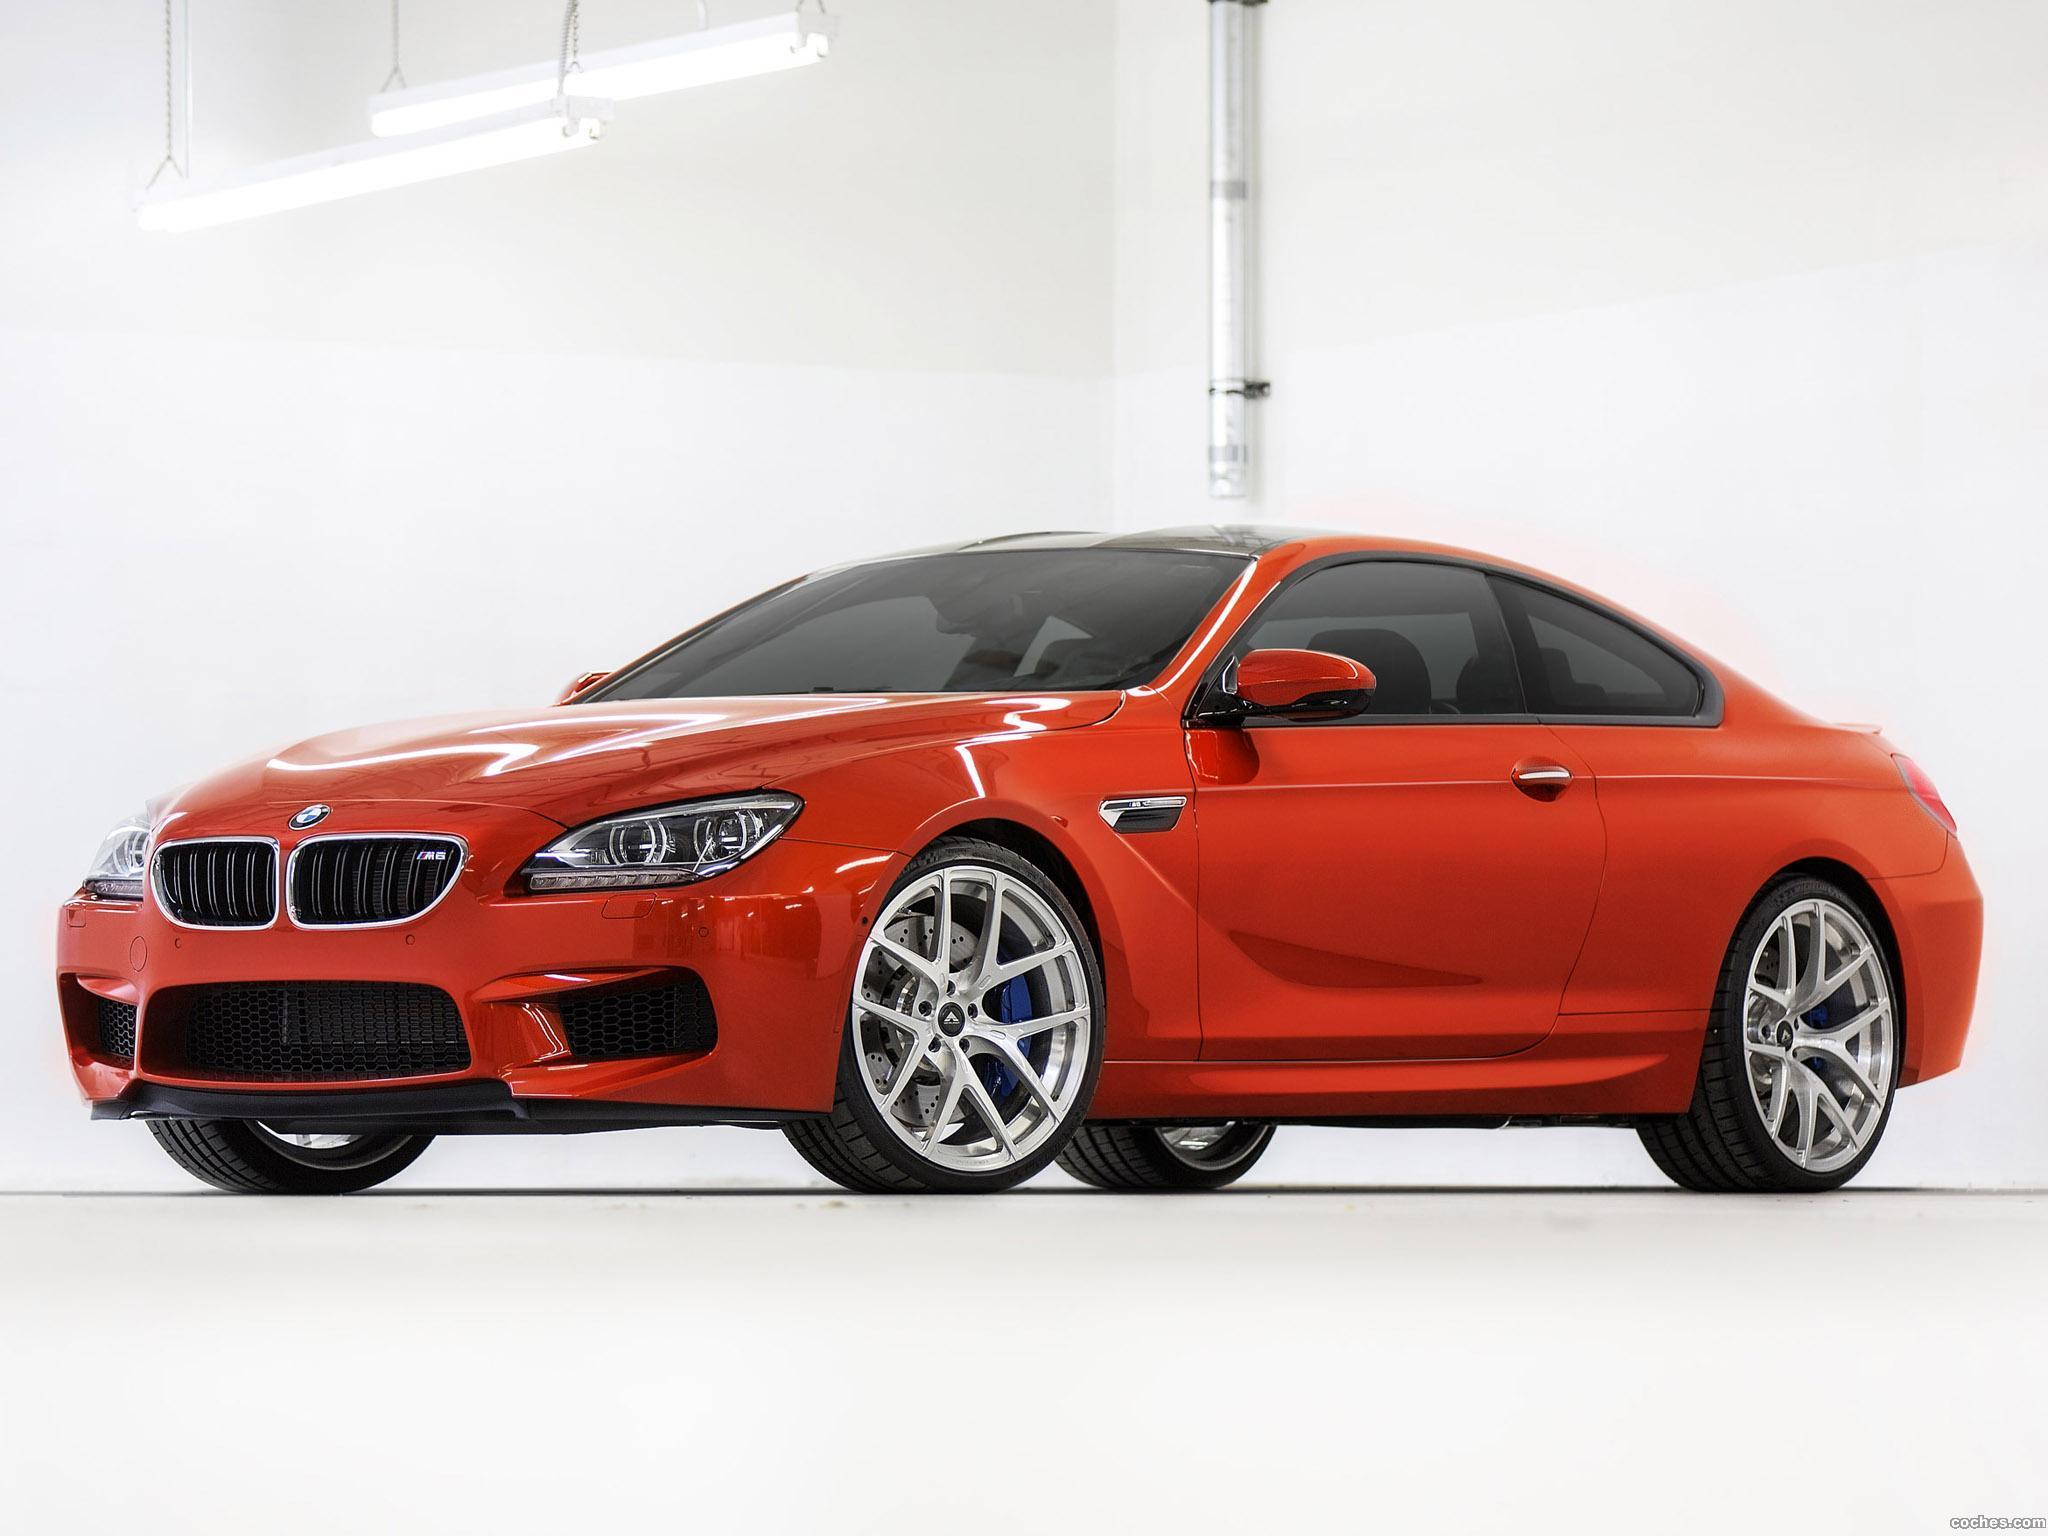 Foto 0 de Vorsteiner BMW Serie 6 M6 Coupe VS-110 2013